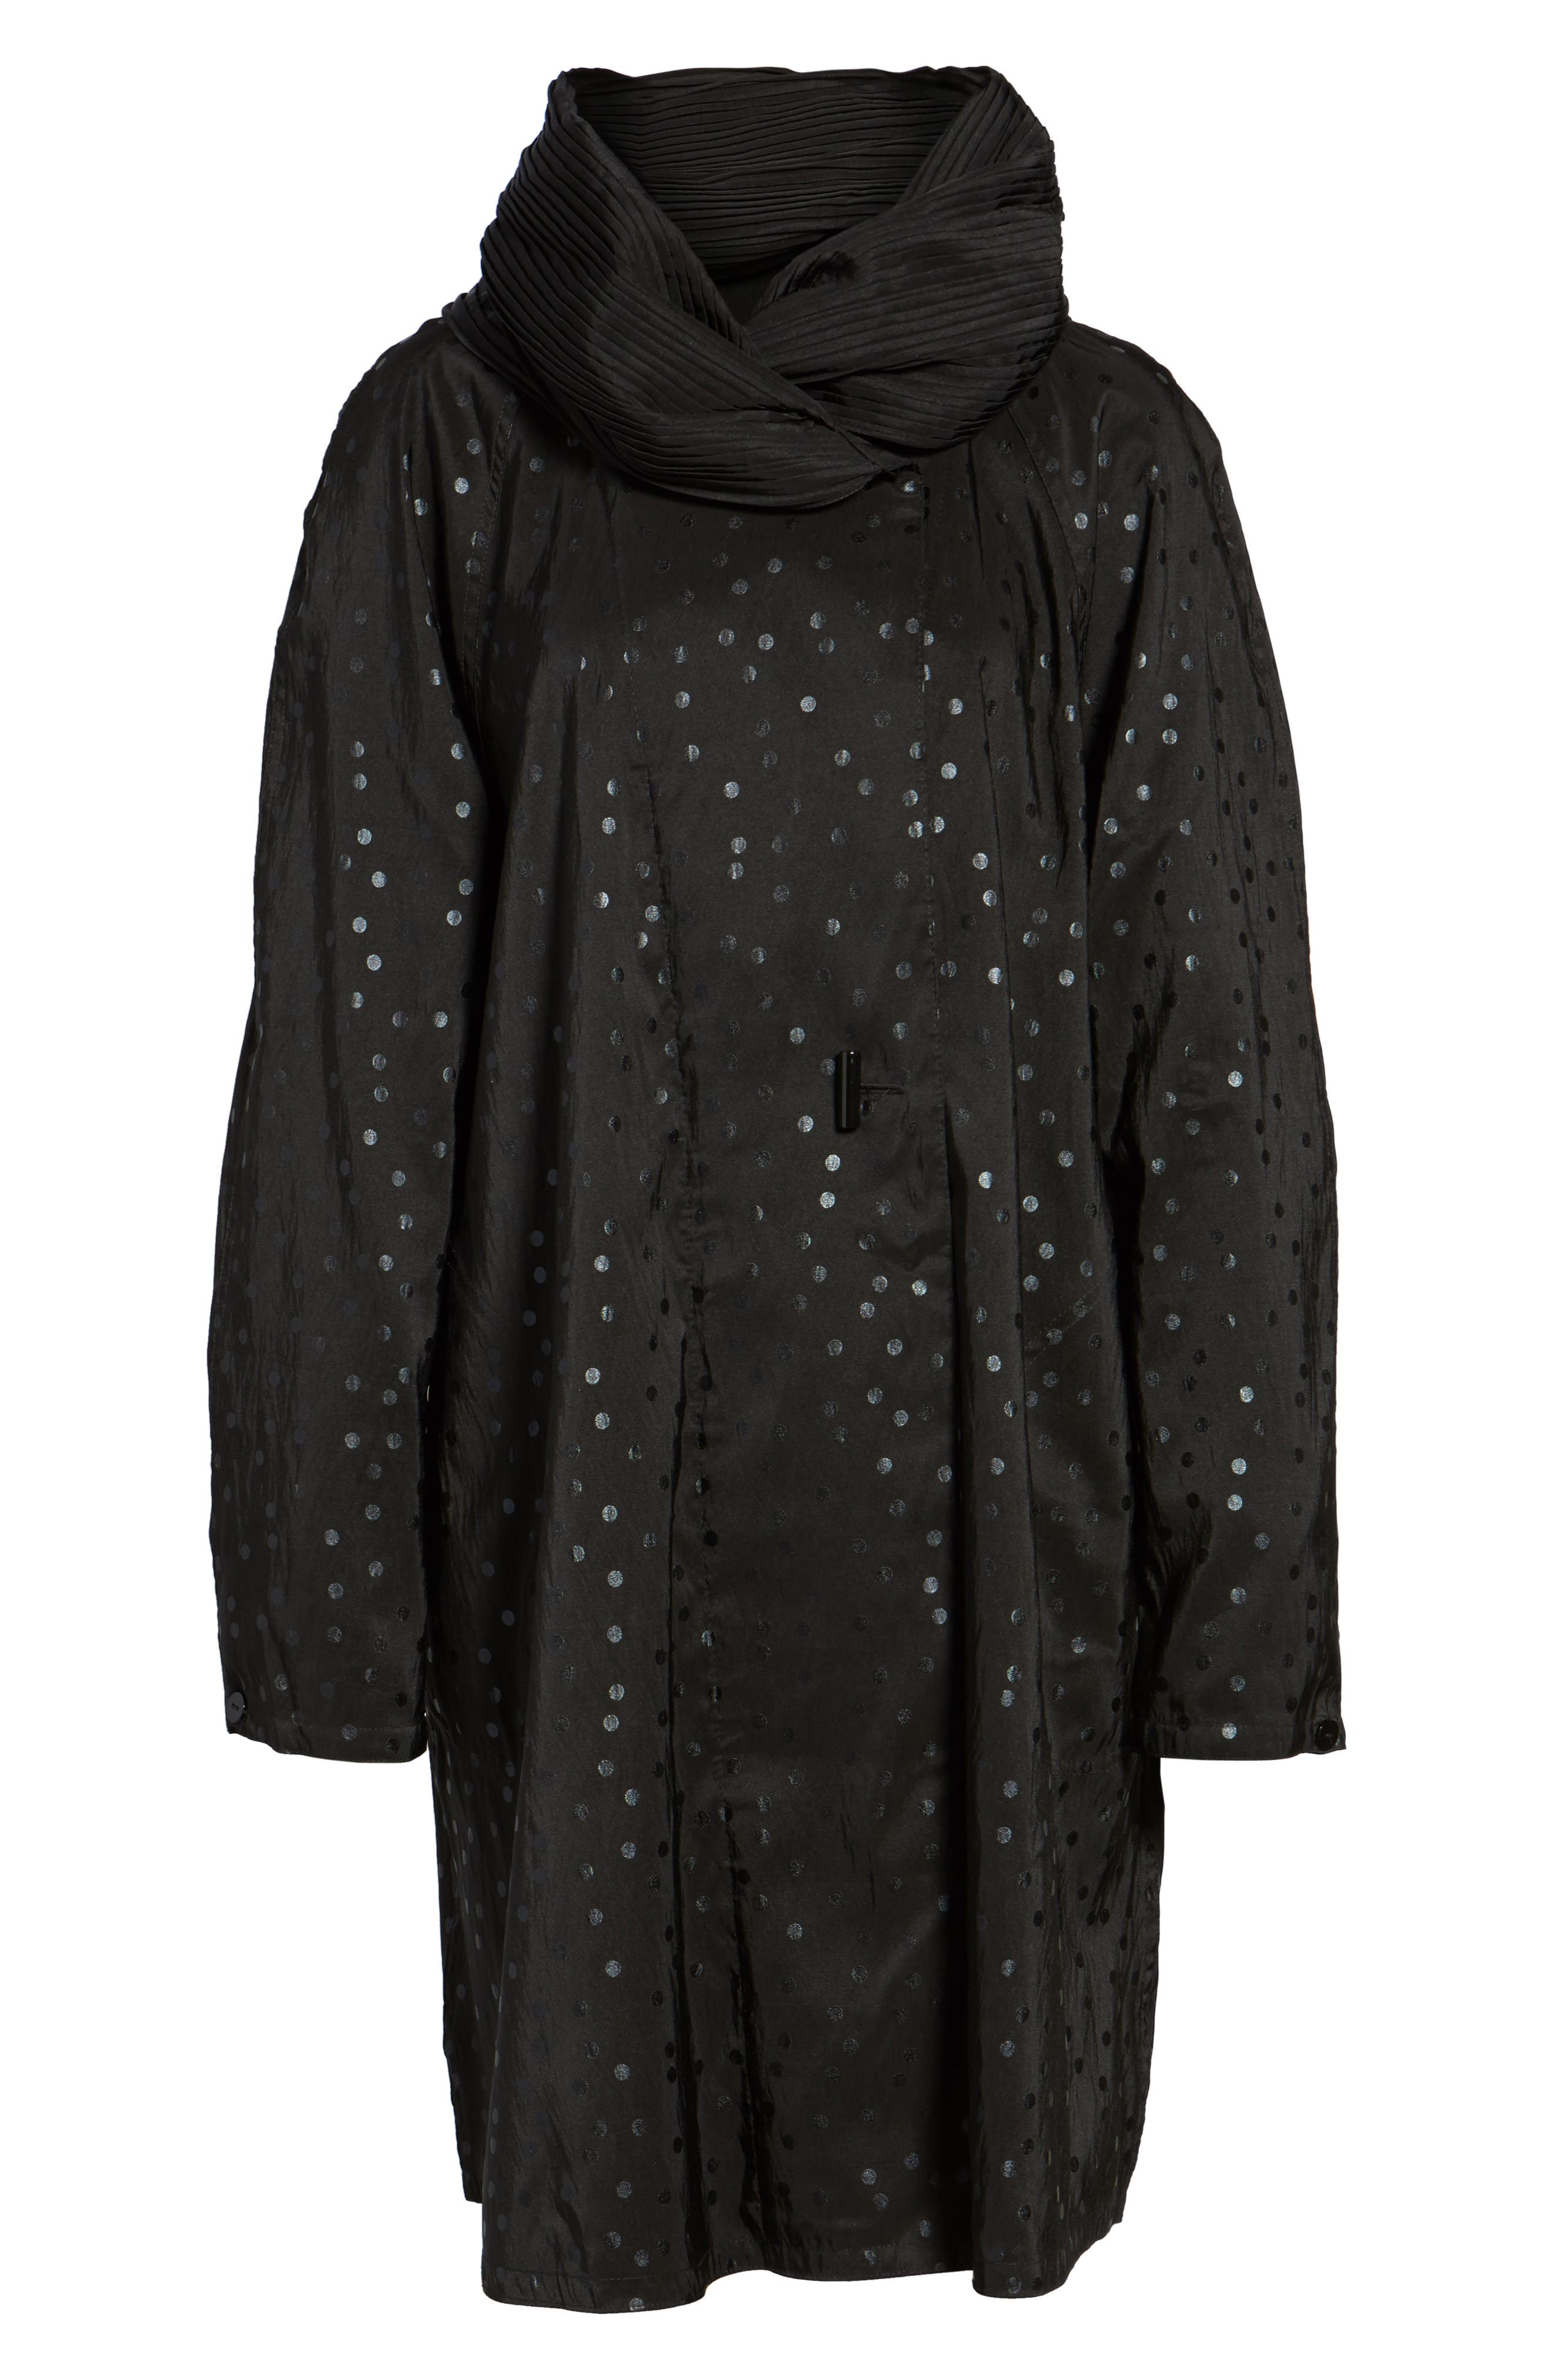 'Donatella' Reversible Dot Pleat Hood Packable Travel Coat,                             Alternate thumbnail 6, color,                             017